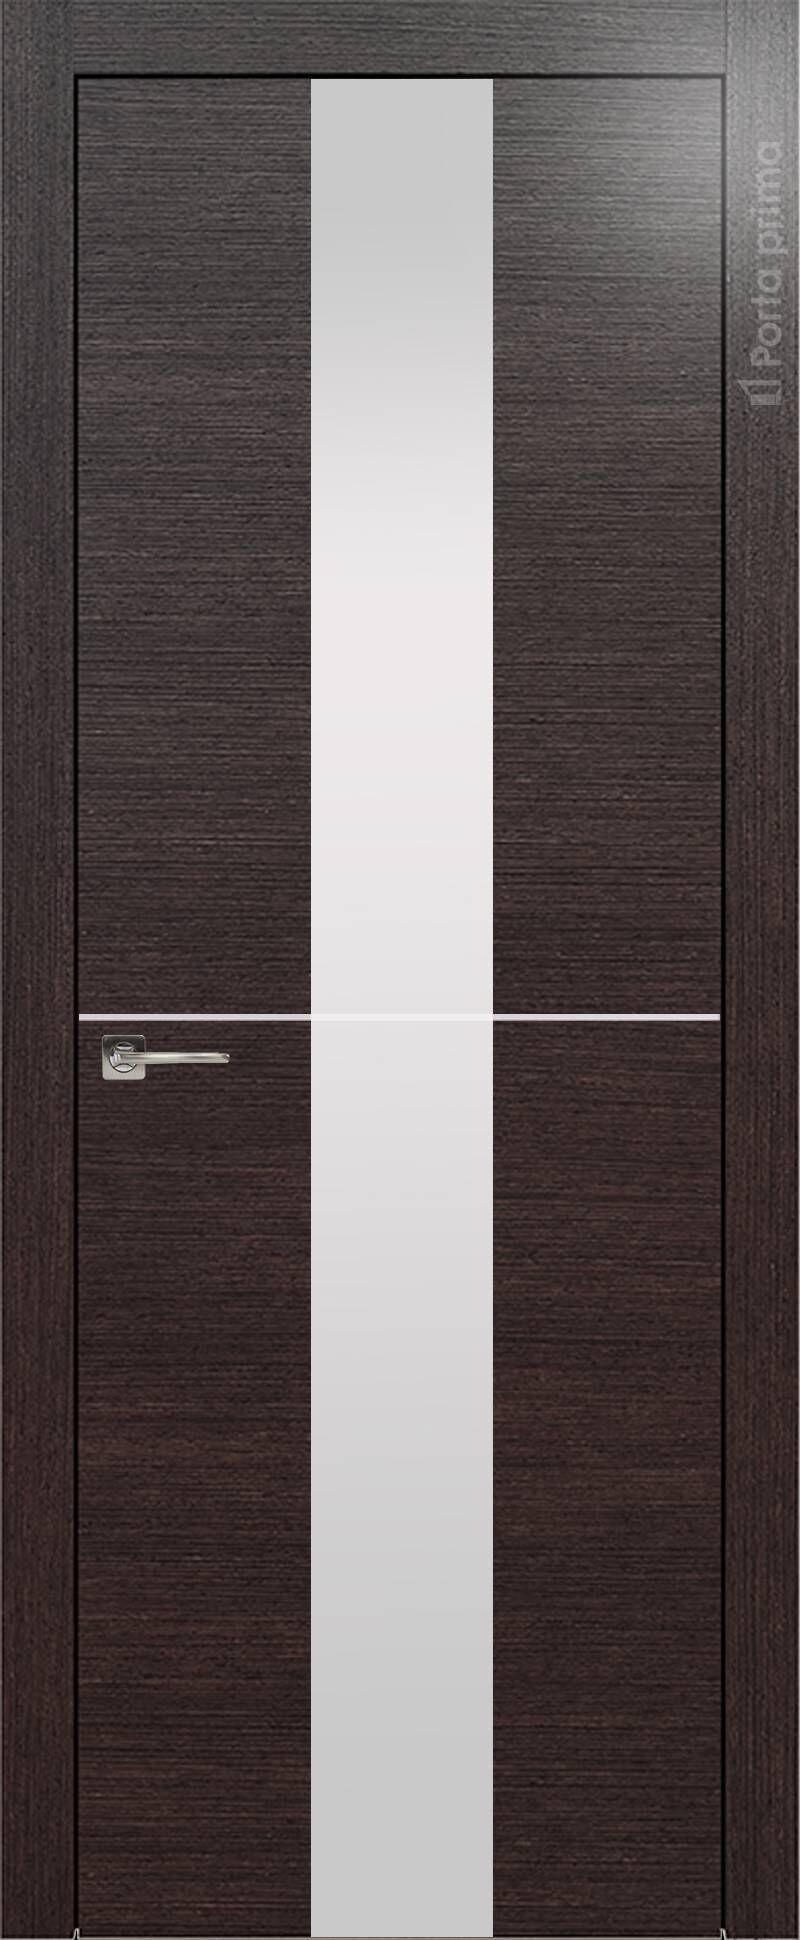 Tivoli Ж-3 цвет - Венге Шоколад Со стеклом (ДО)